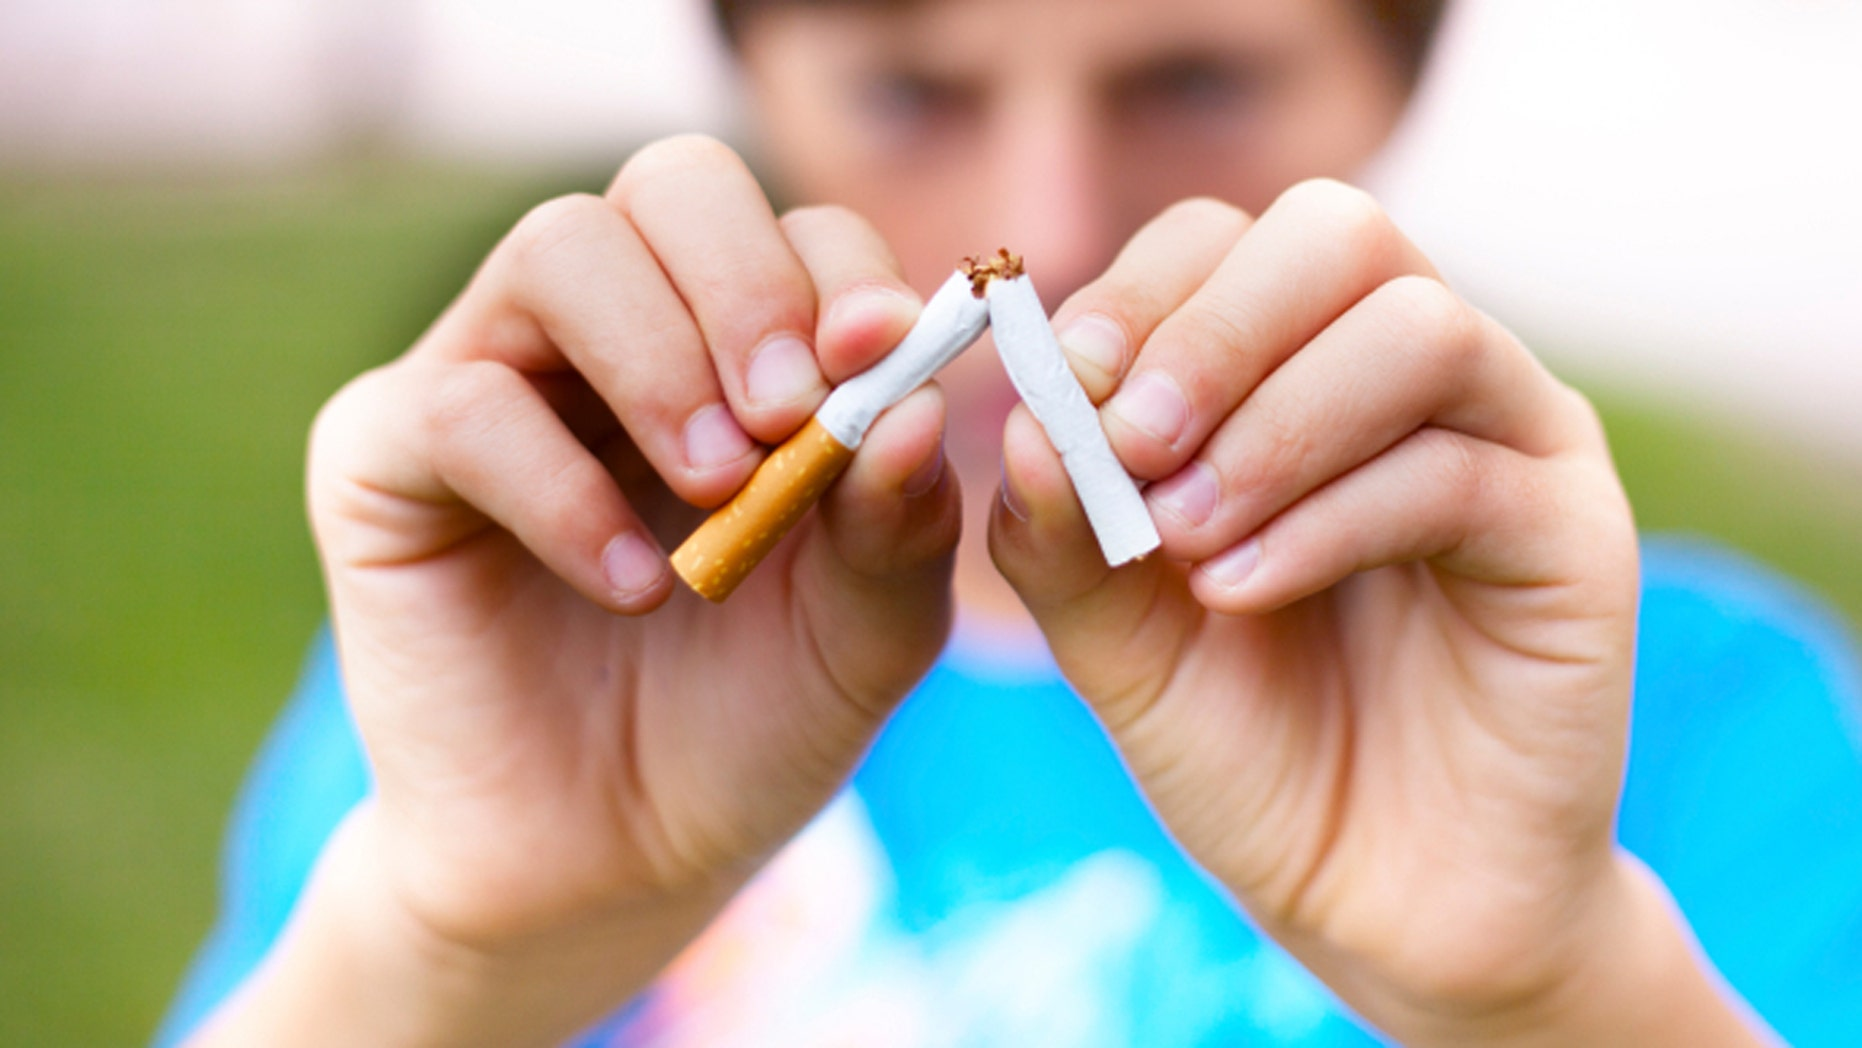 Young boy breaks a cigarette. Selective focus.